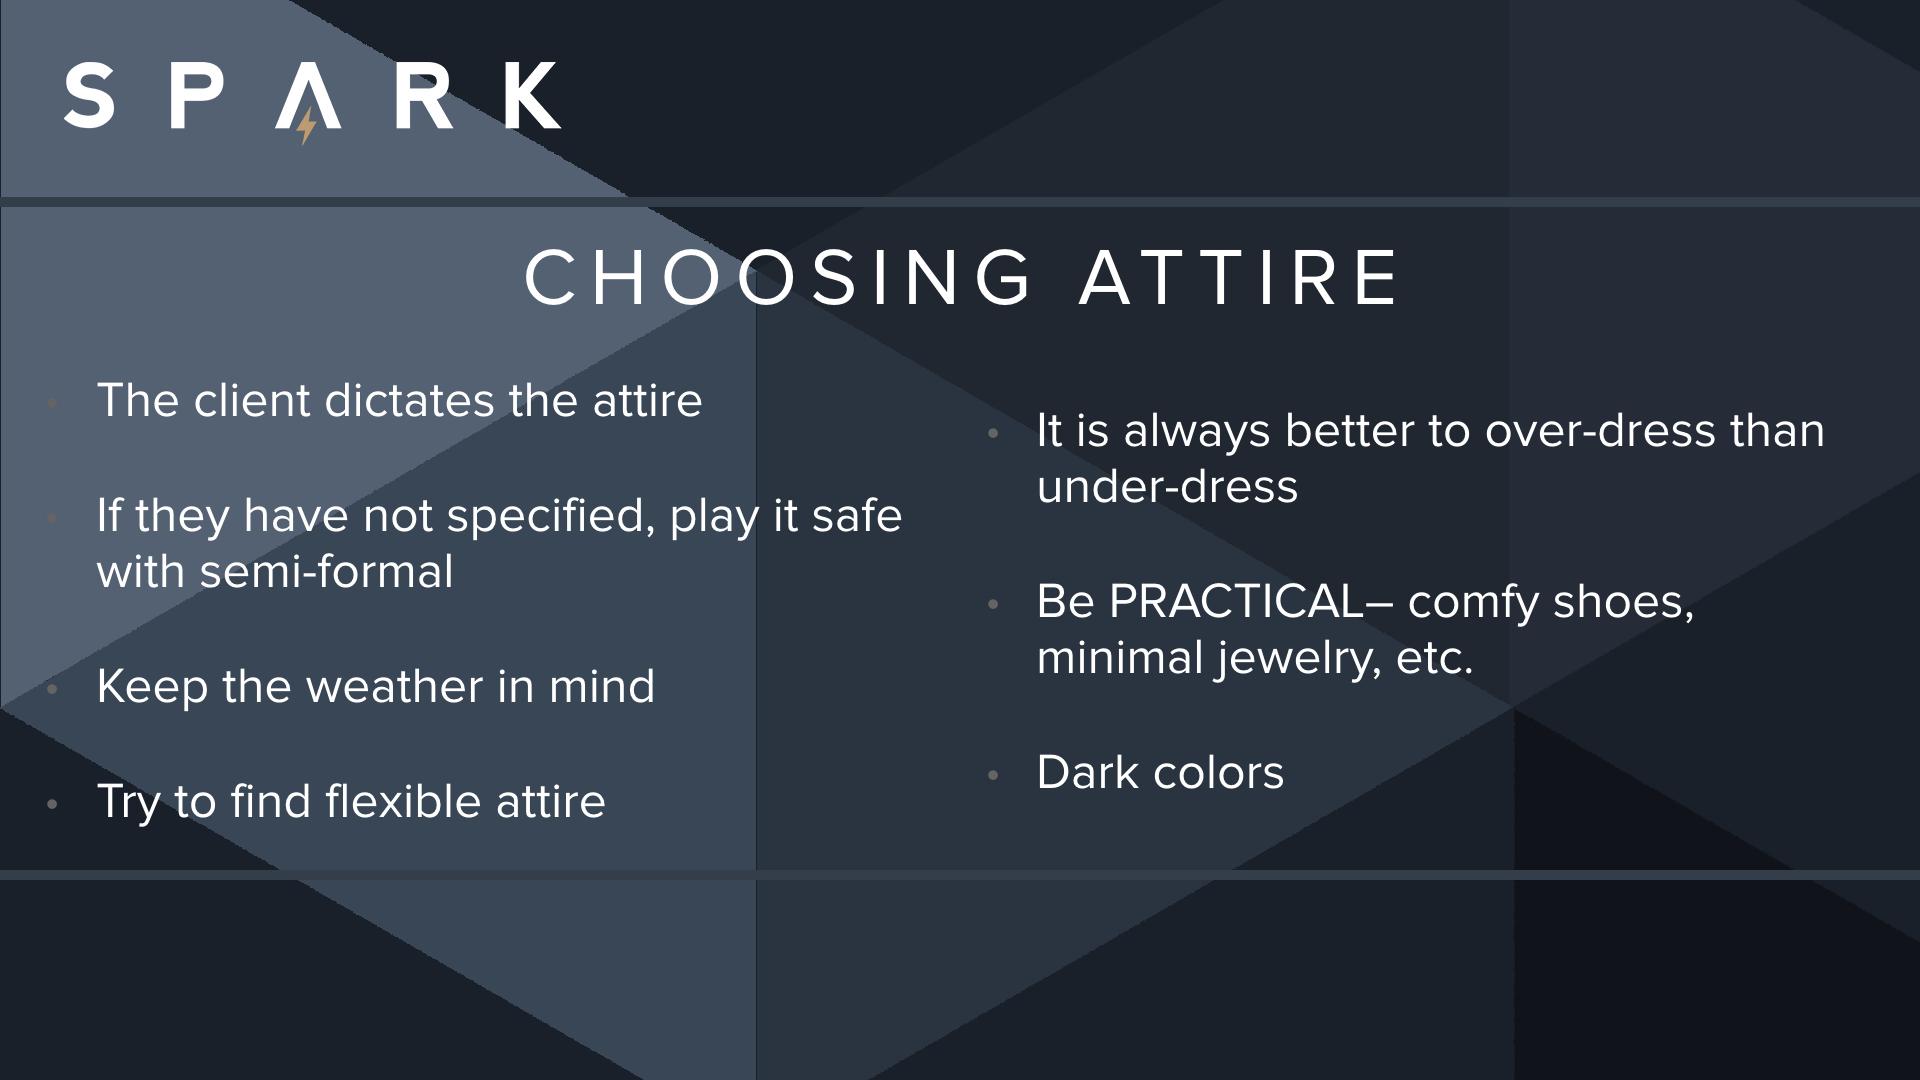 Spark Training Keynote Template Etiquette.002.jpeg